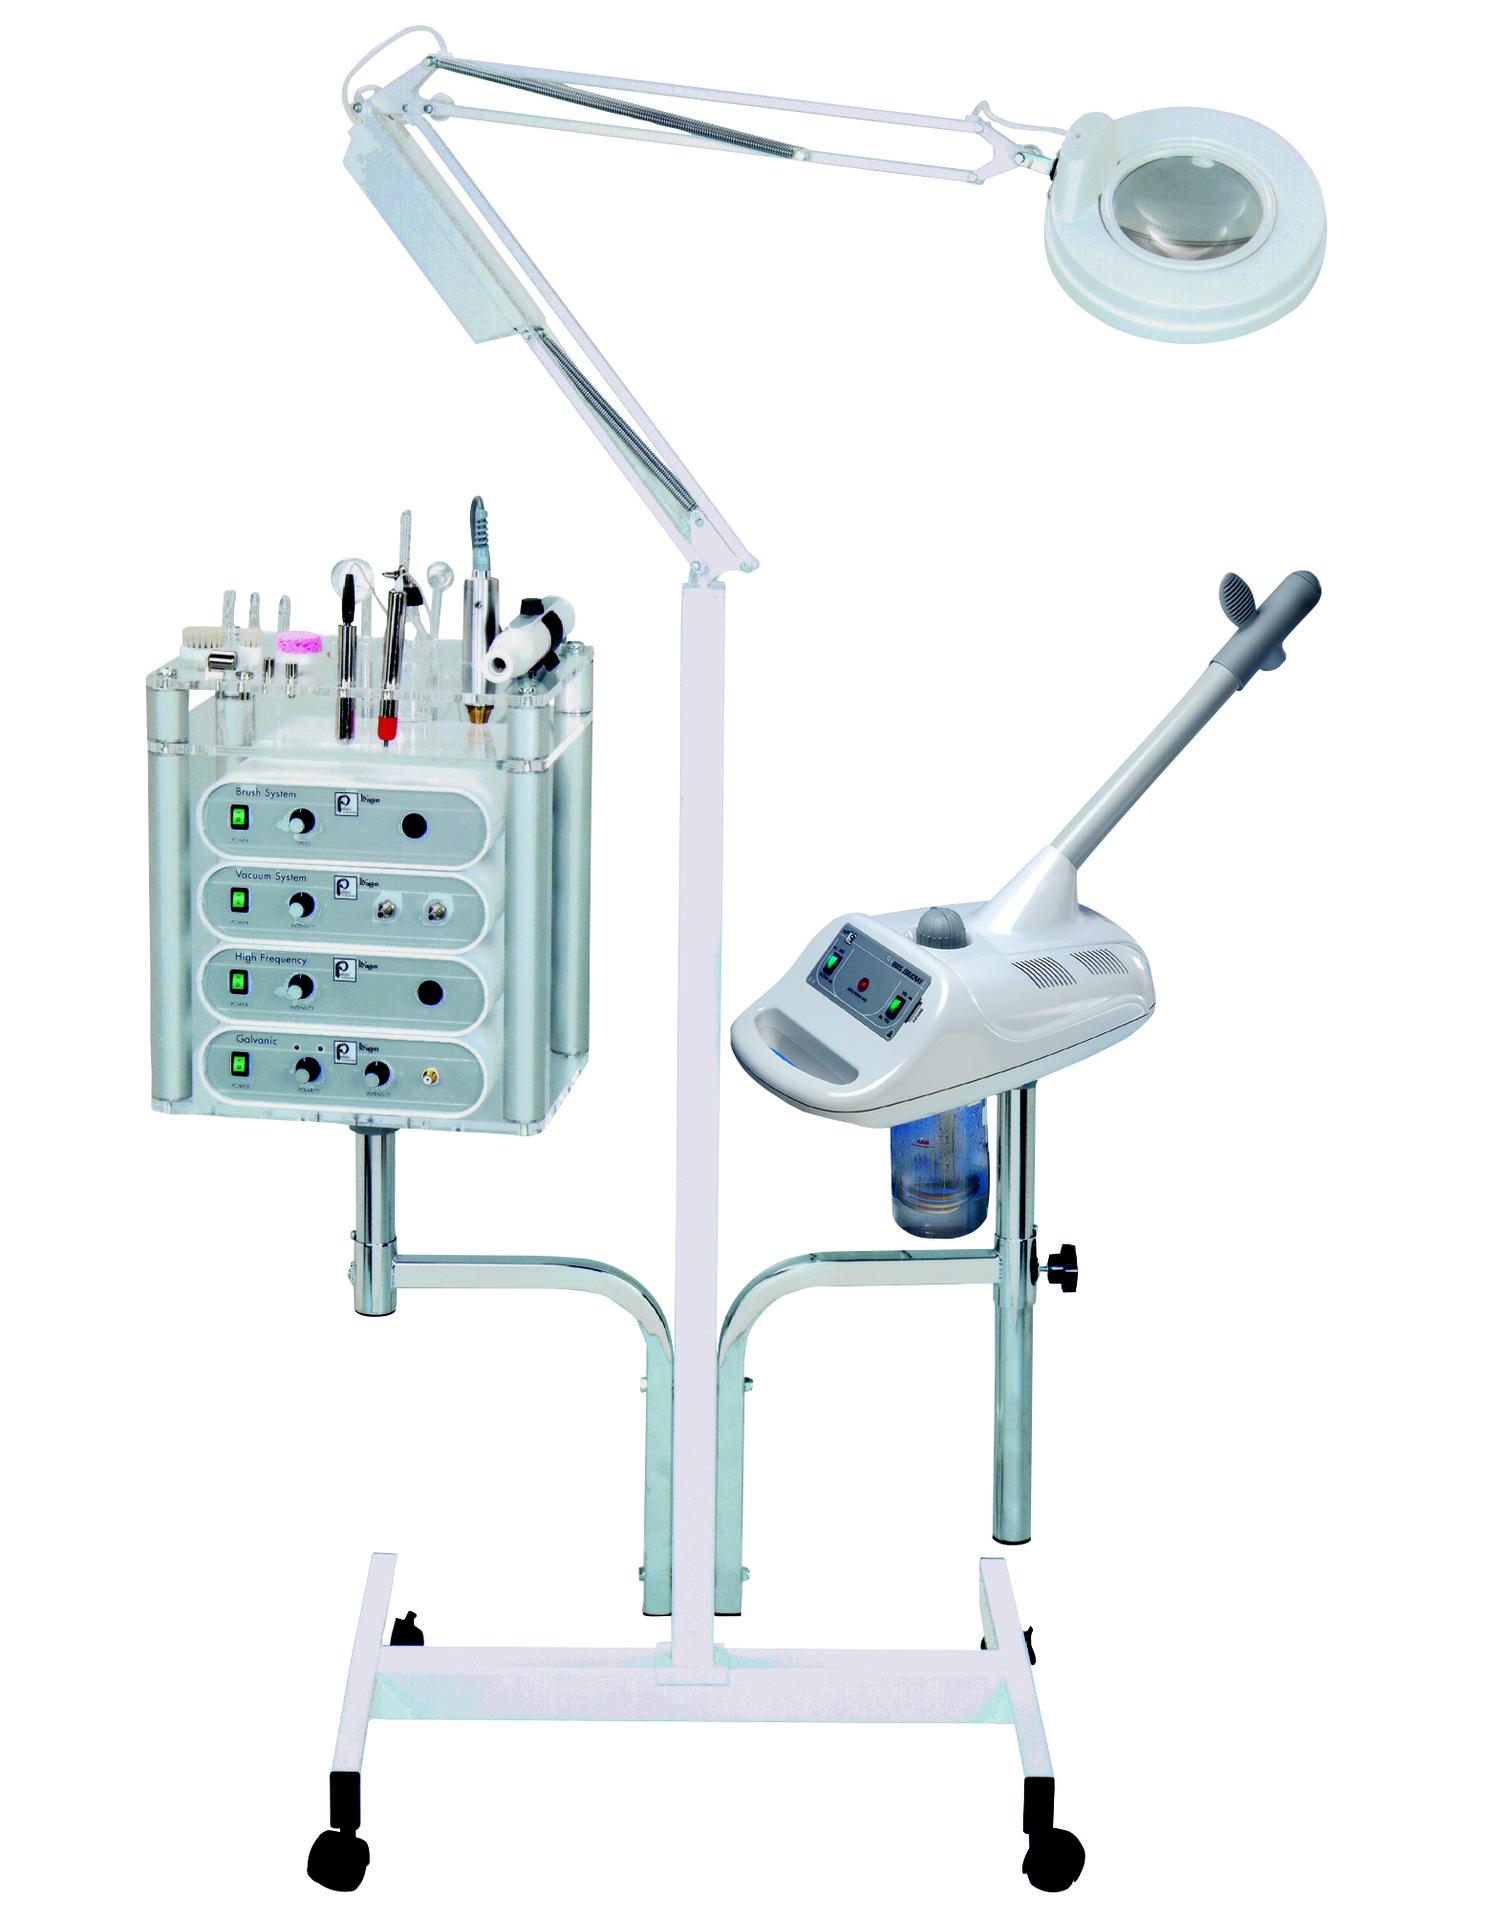 compu lift machine